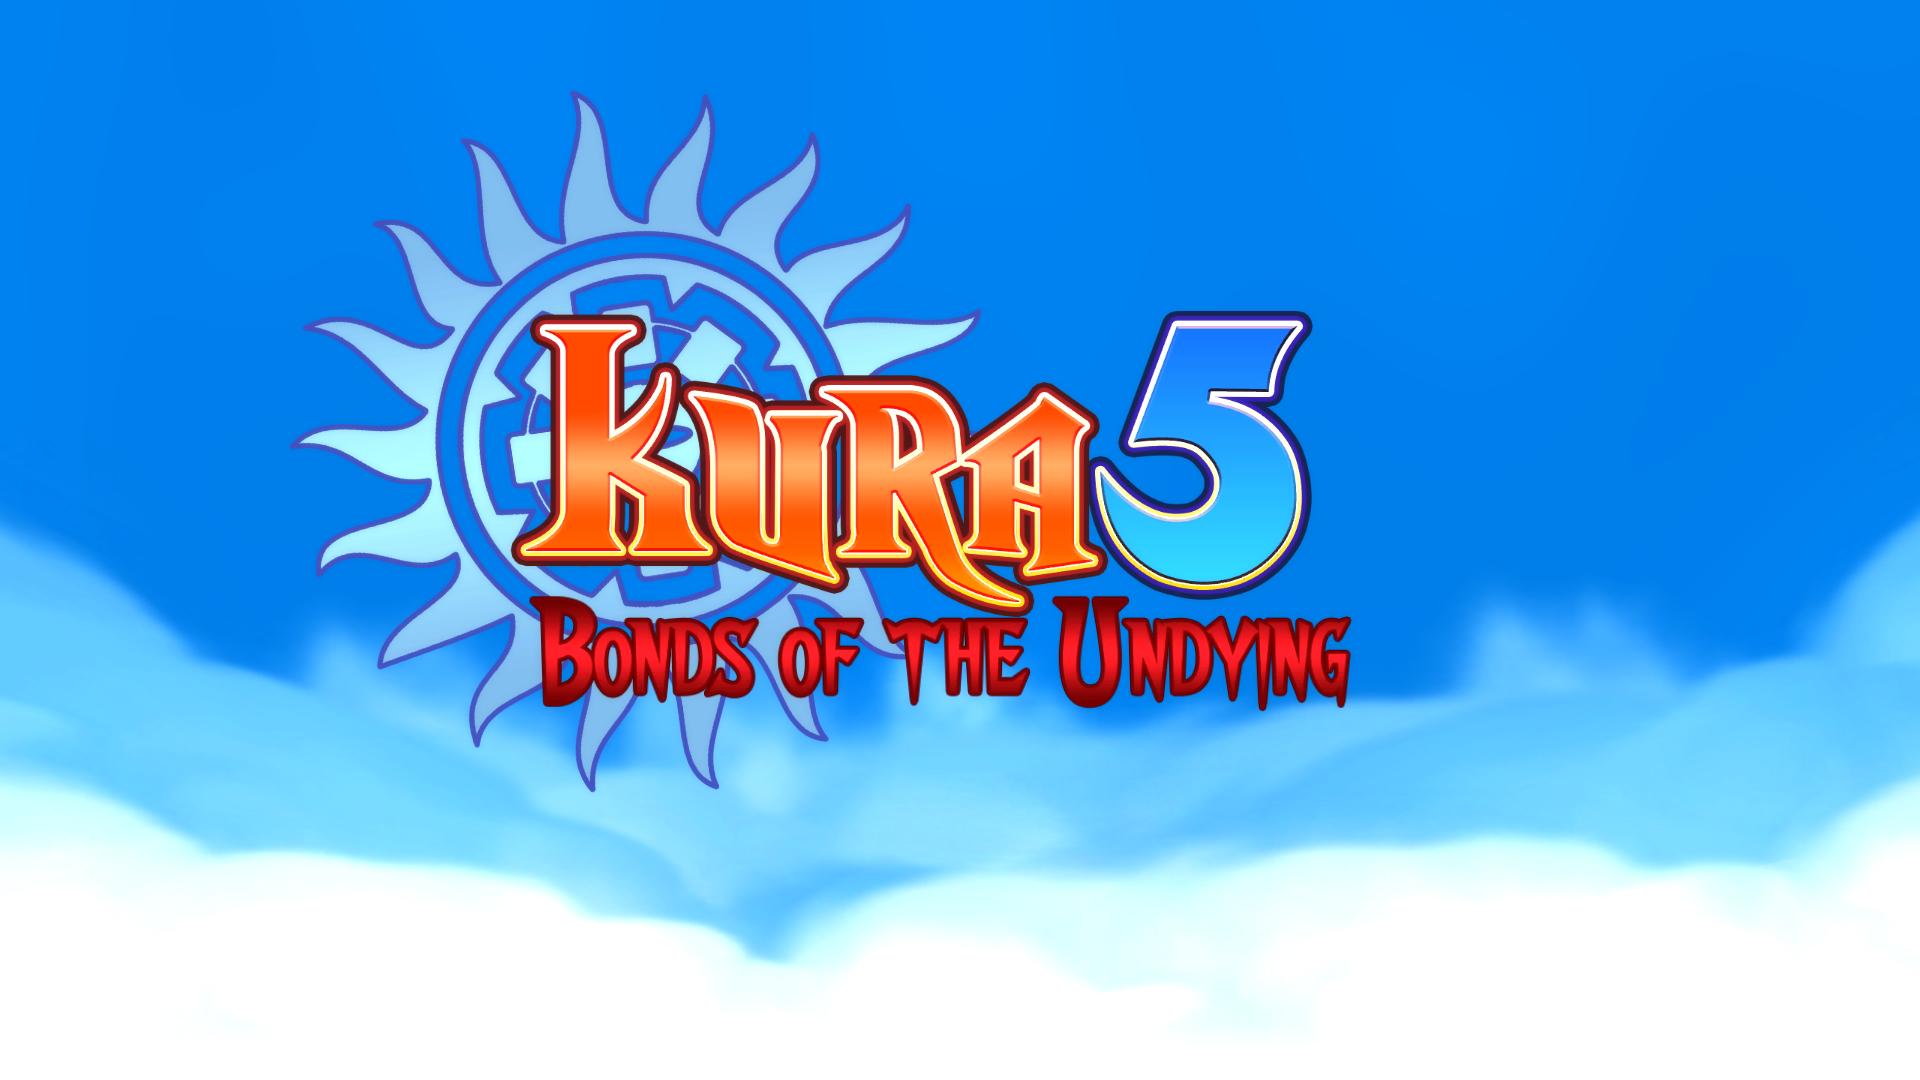 Kura5: Bonds of the Undying V0.2.0.2